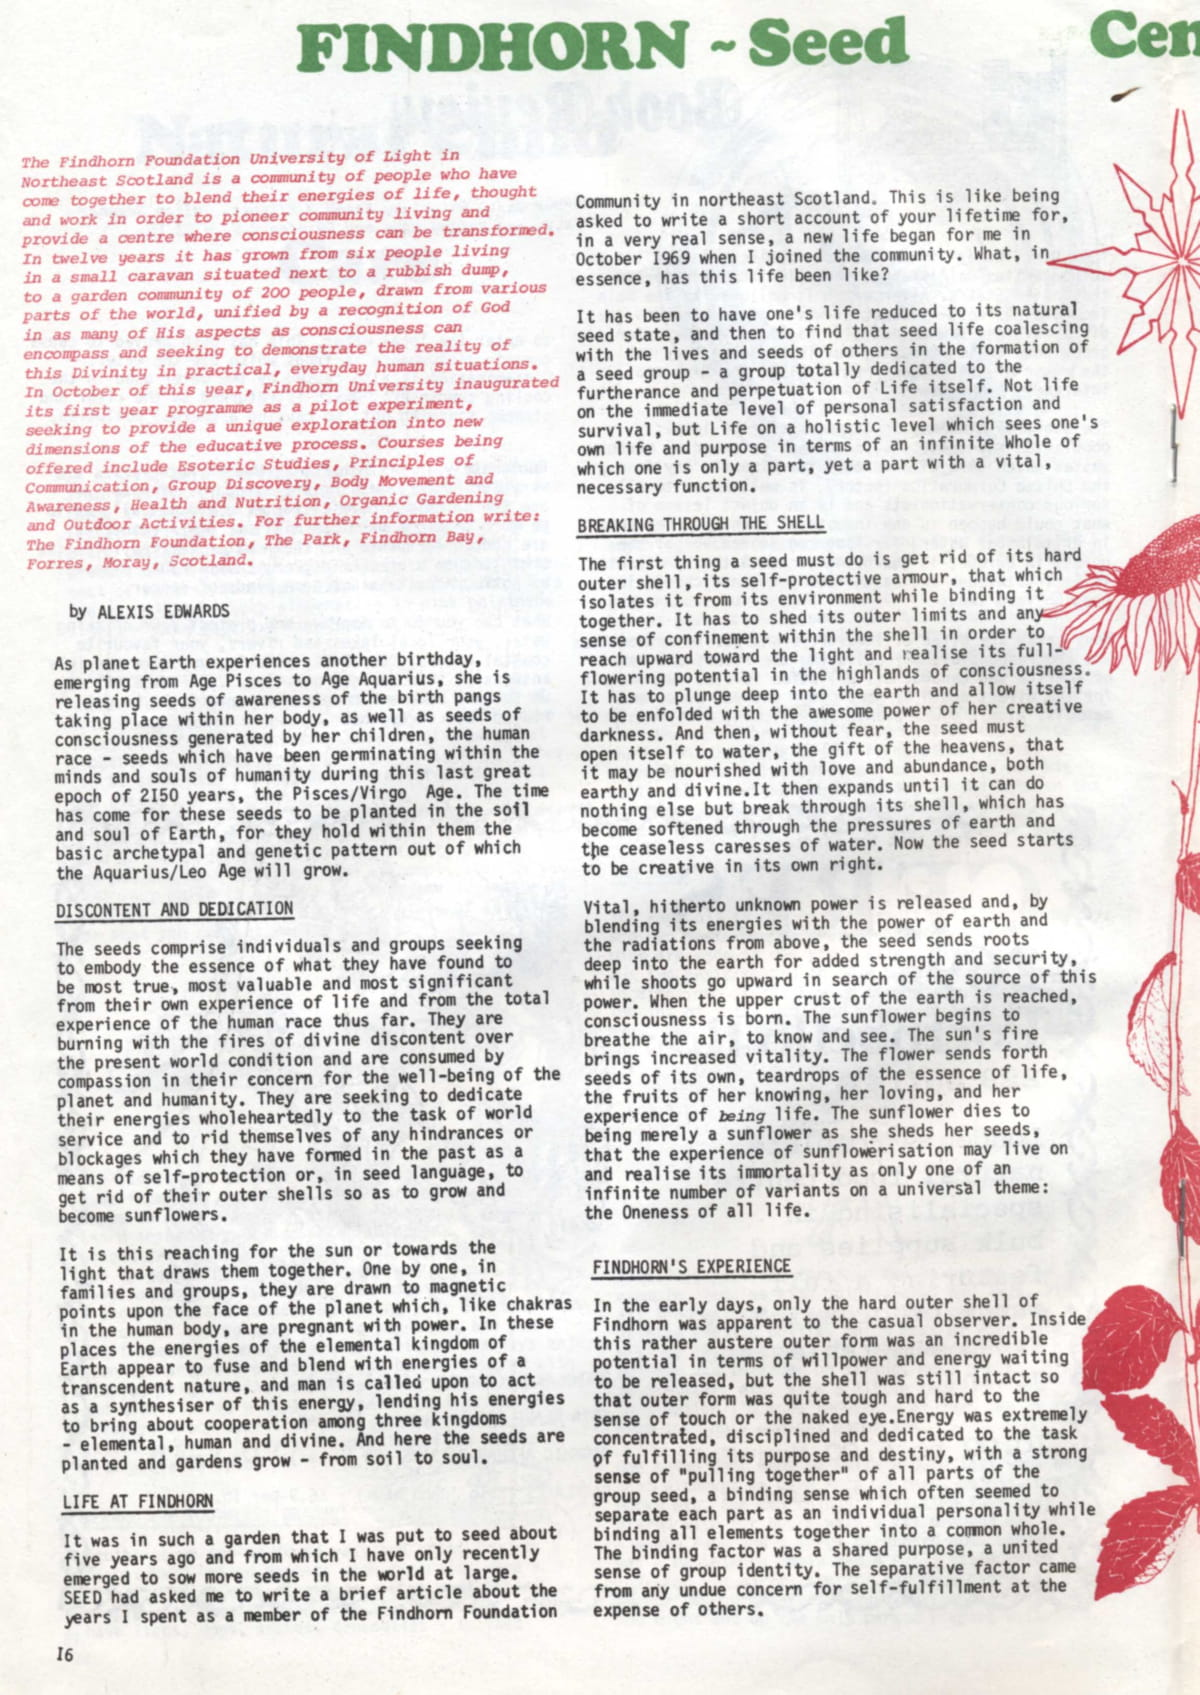 seed-v3-n11-nov1974-16.jpg